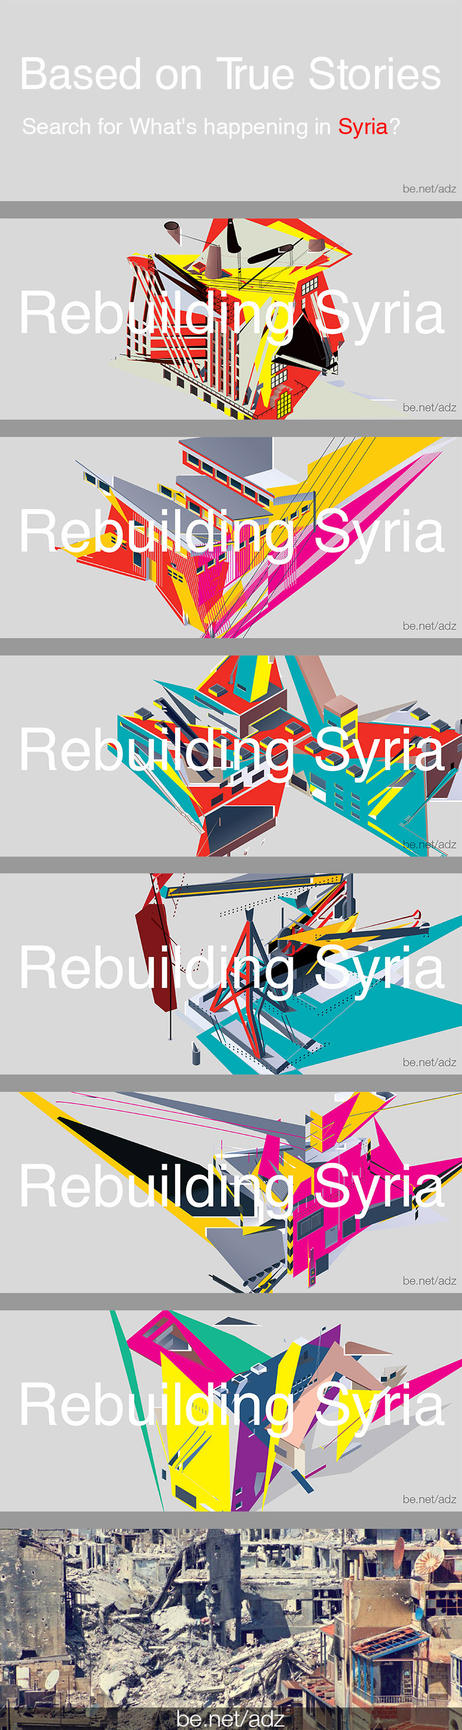 Rebuilding Syria by adnanalsouri